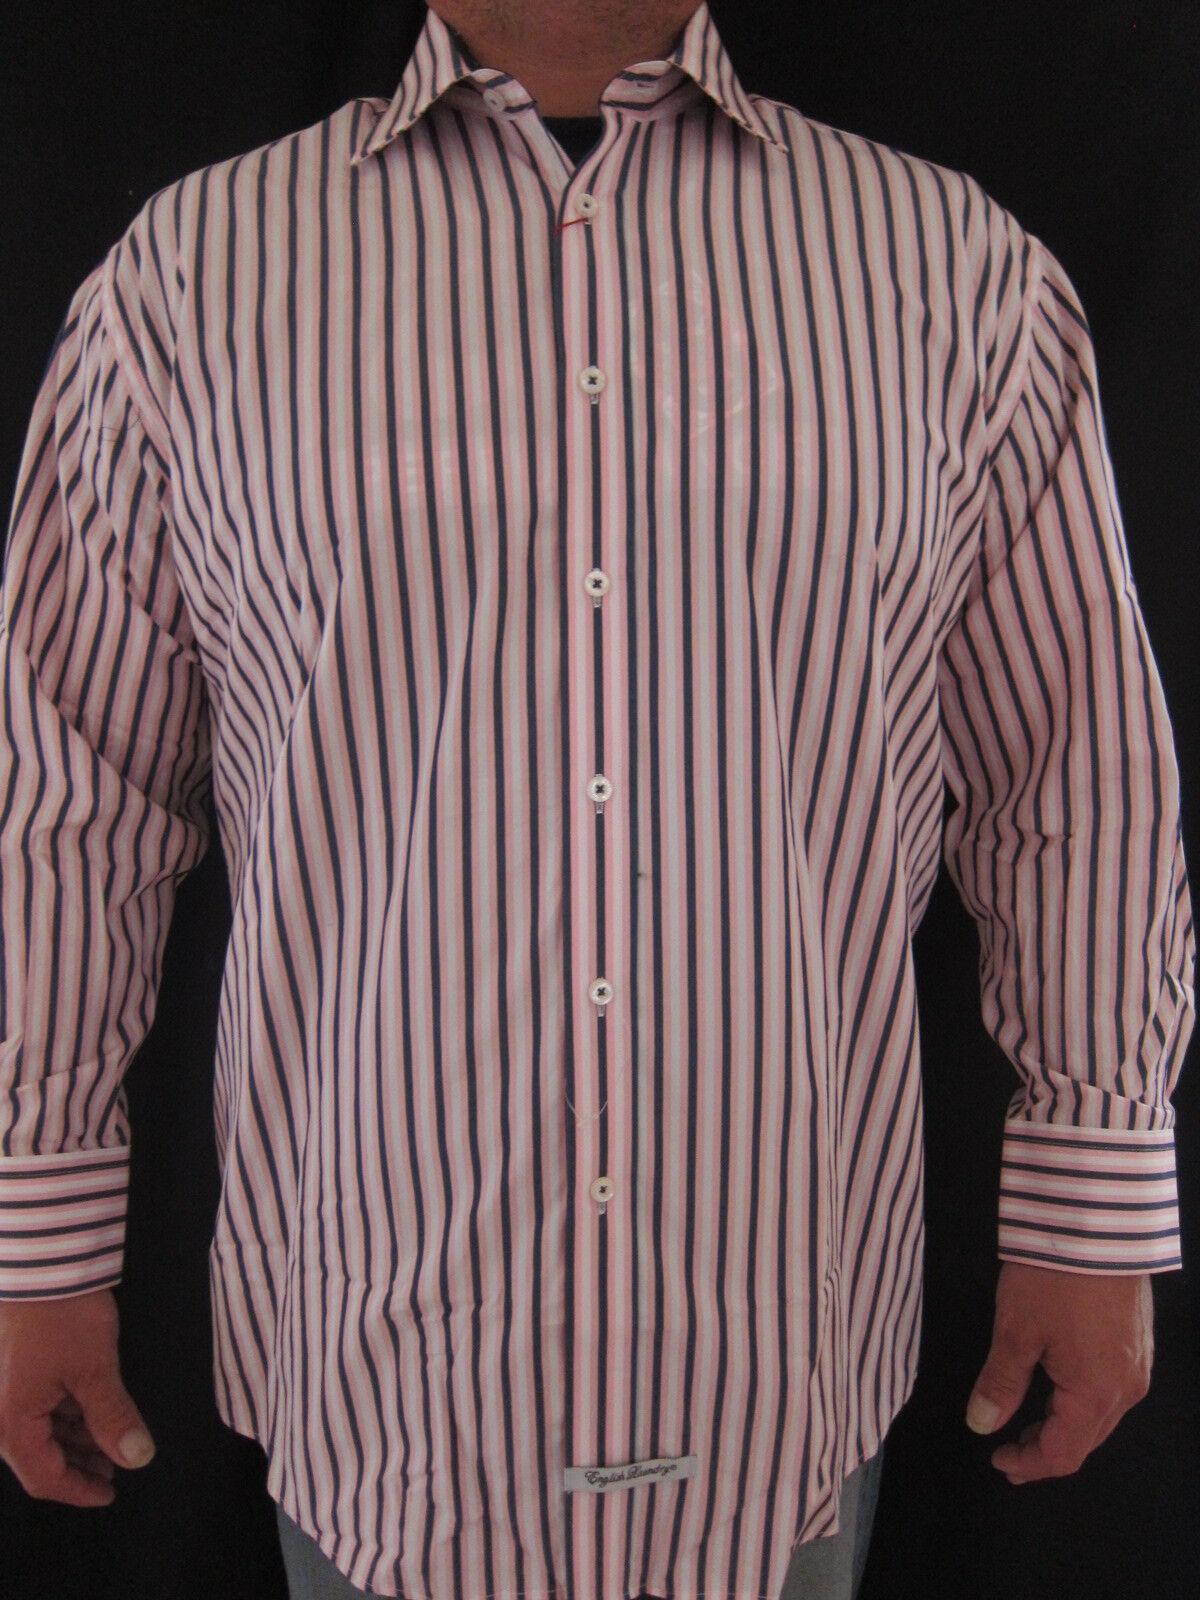 ENGLISH LAUNDRY Christoper Wicks 100% baumwolle Striped Dress hemd 17.5 32 33 NWT